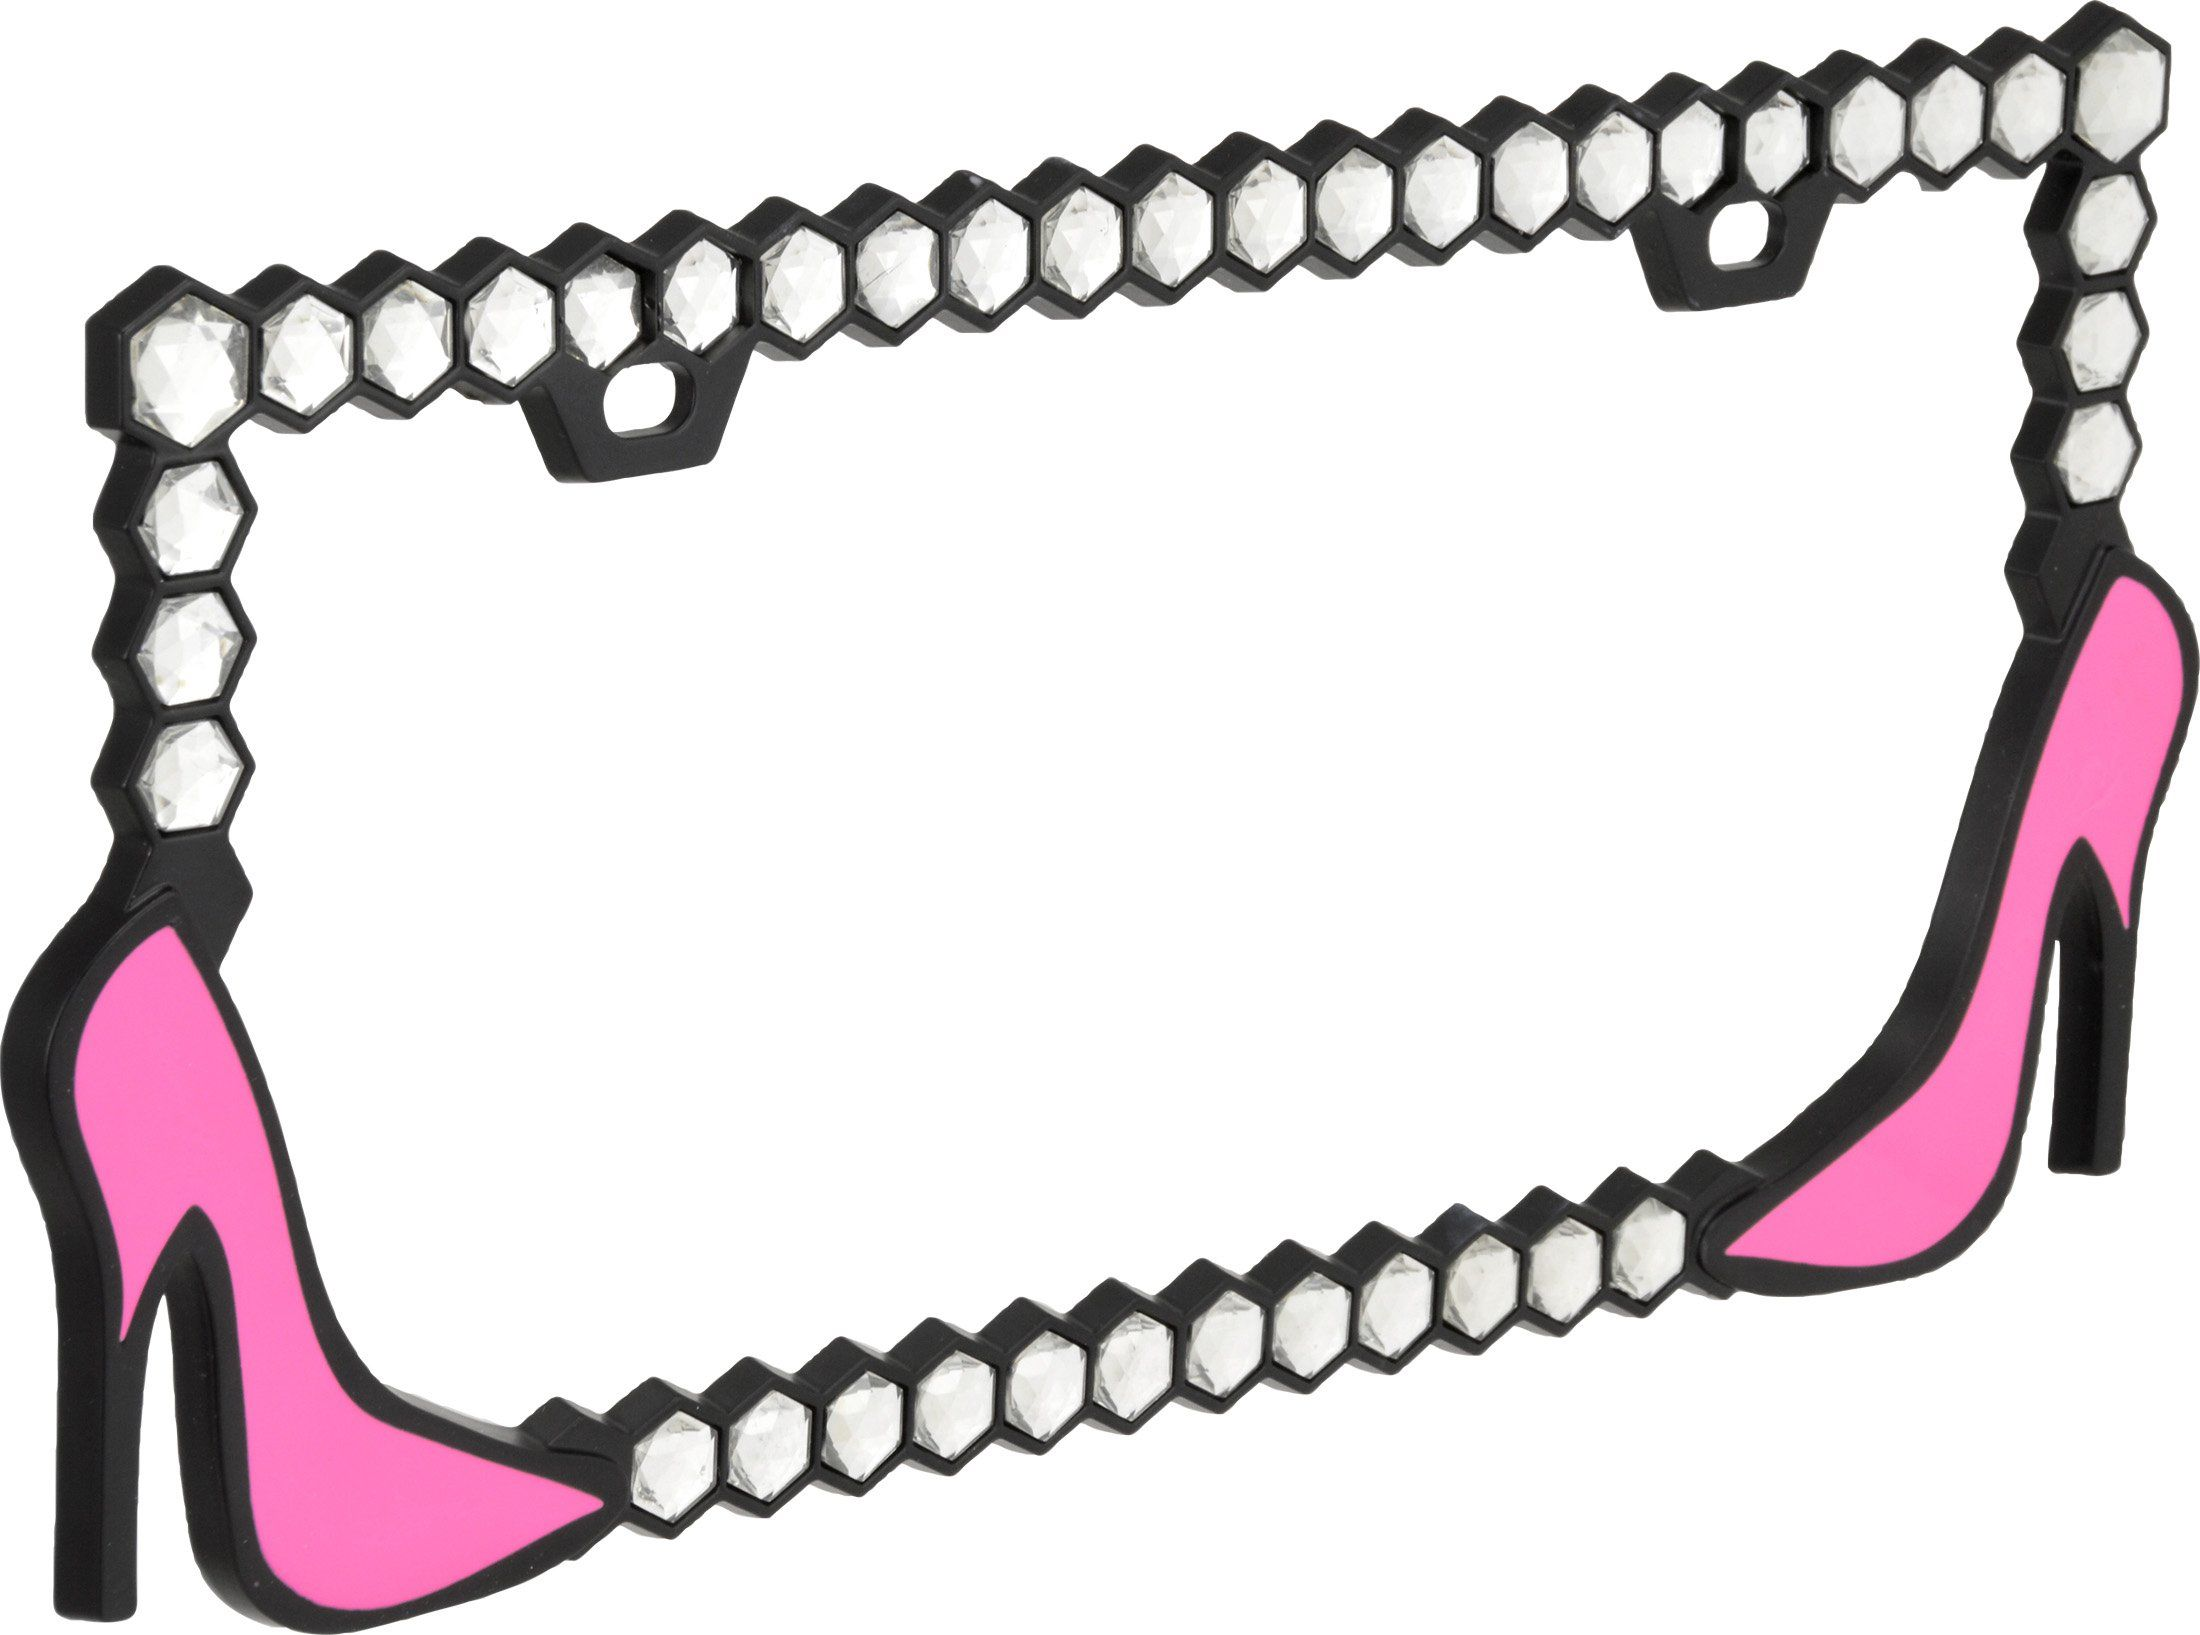 Bell automotive hot pink high heels license plate frame